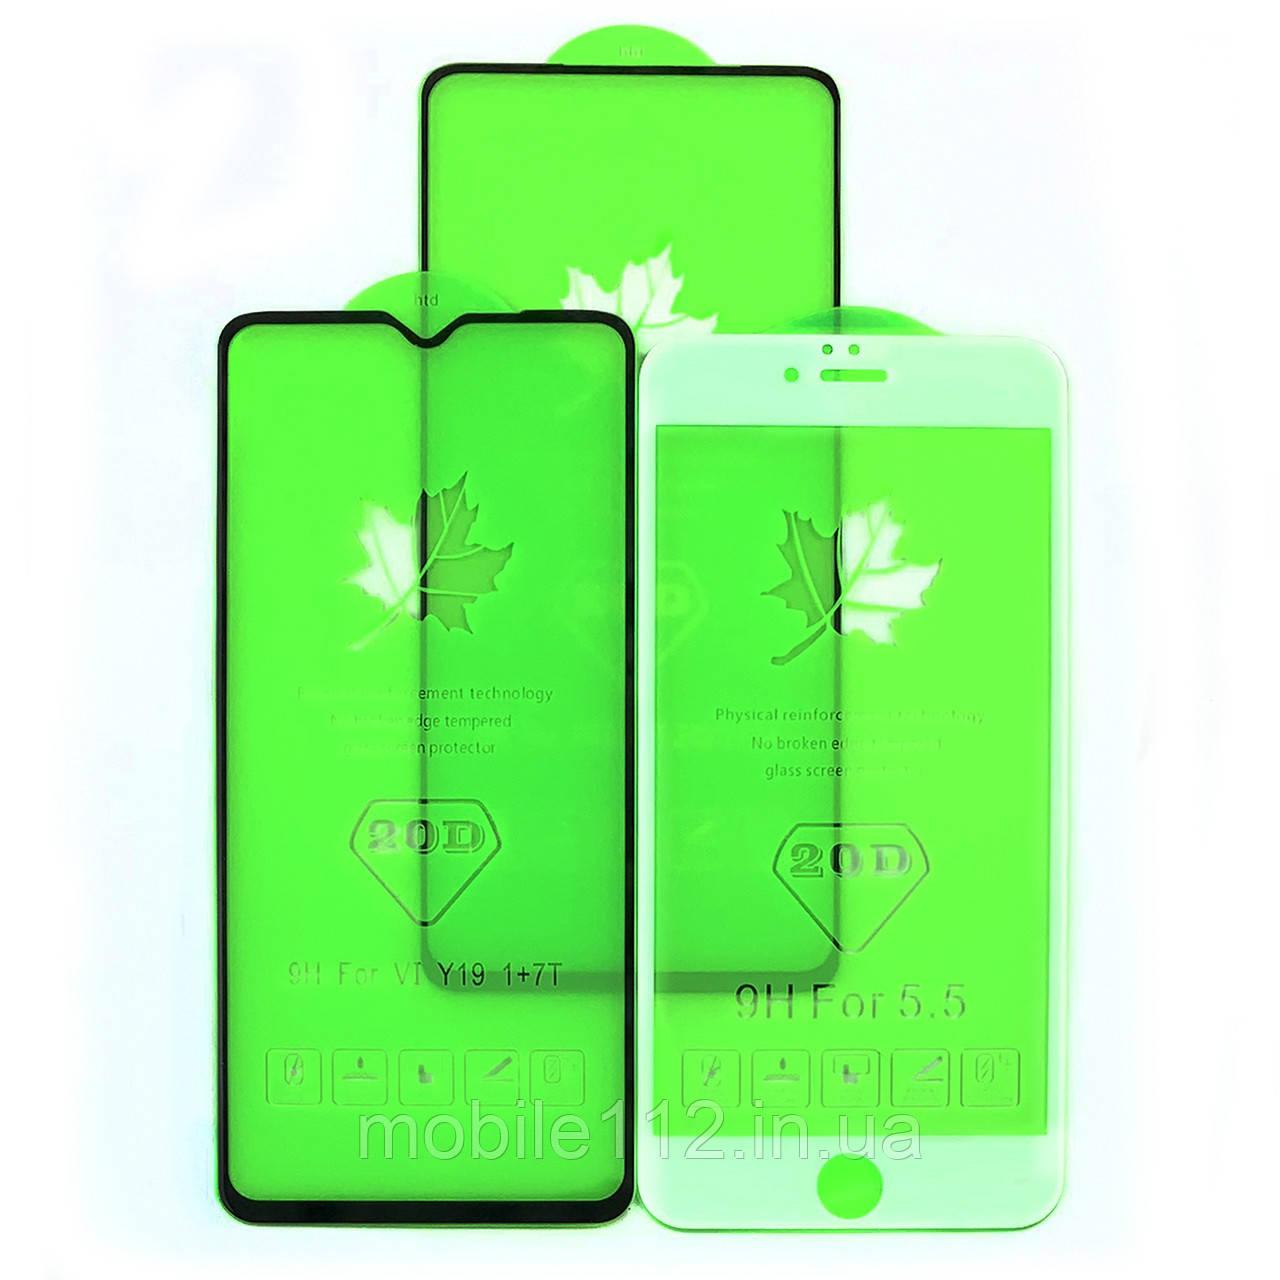 Захисне скло iPhone XS Max, 11 Pro Max чорне 20D Full Glue